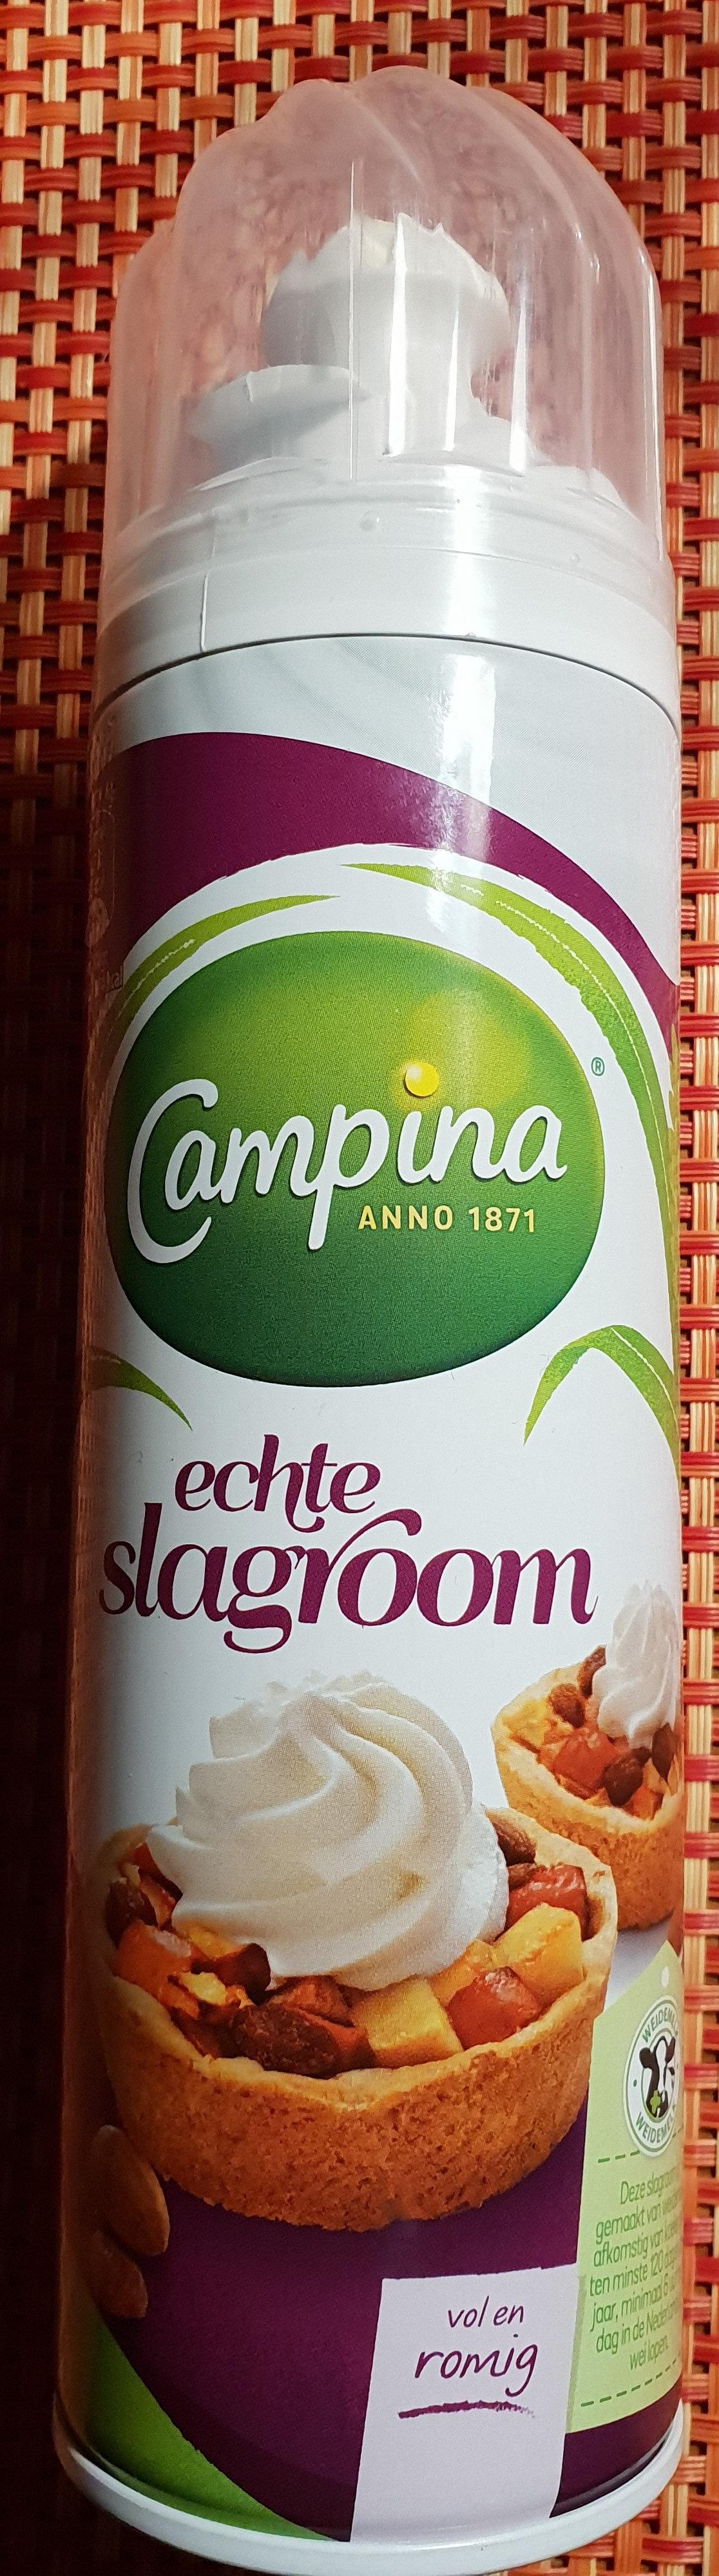 Campina Echte Slagroom - Produit